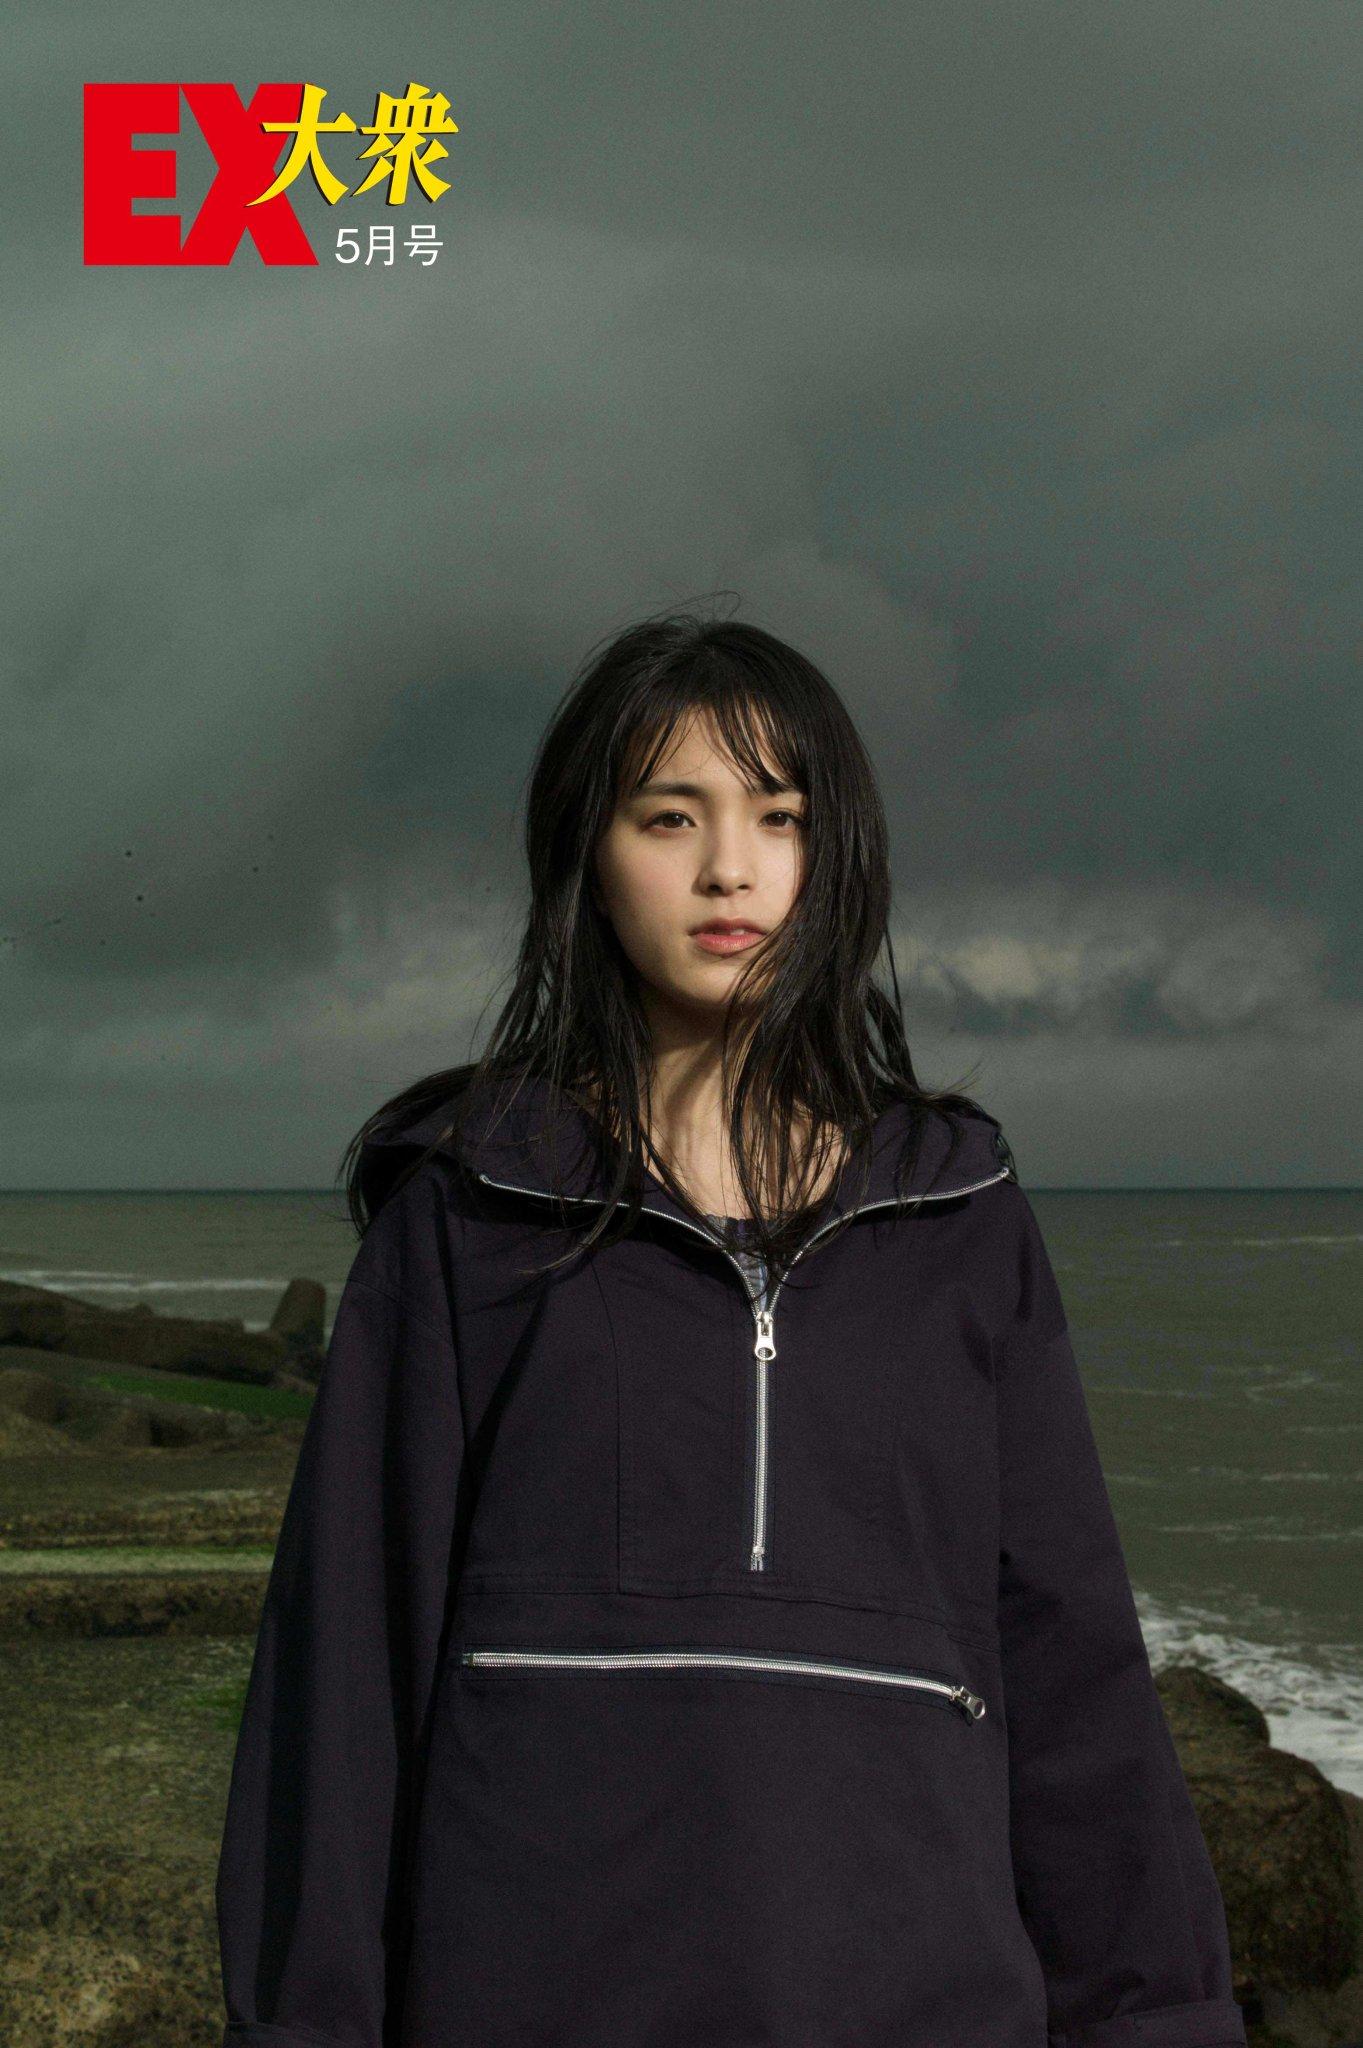 EX大衆2020年5月号大園桃子本誌未掲載カット1